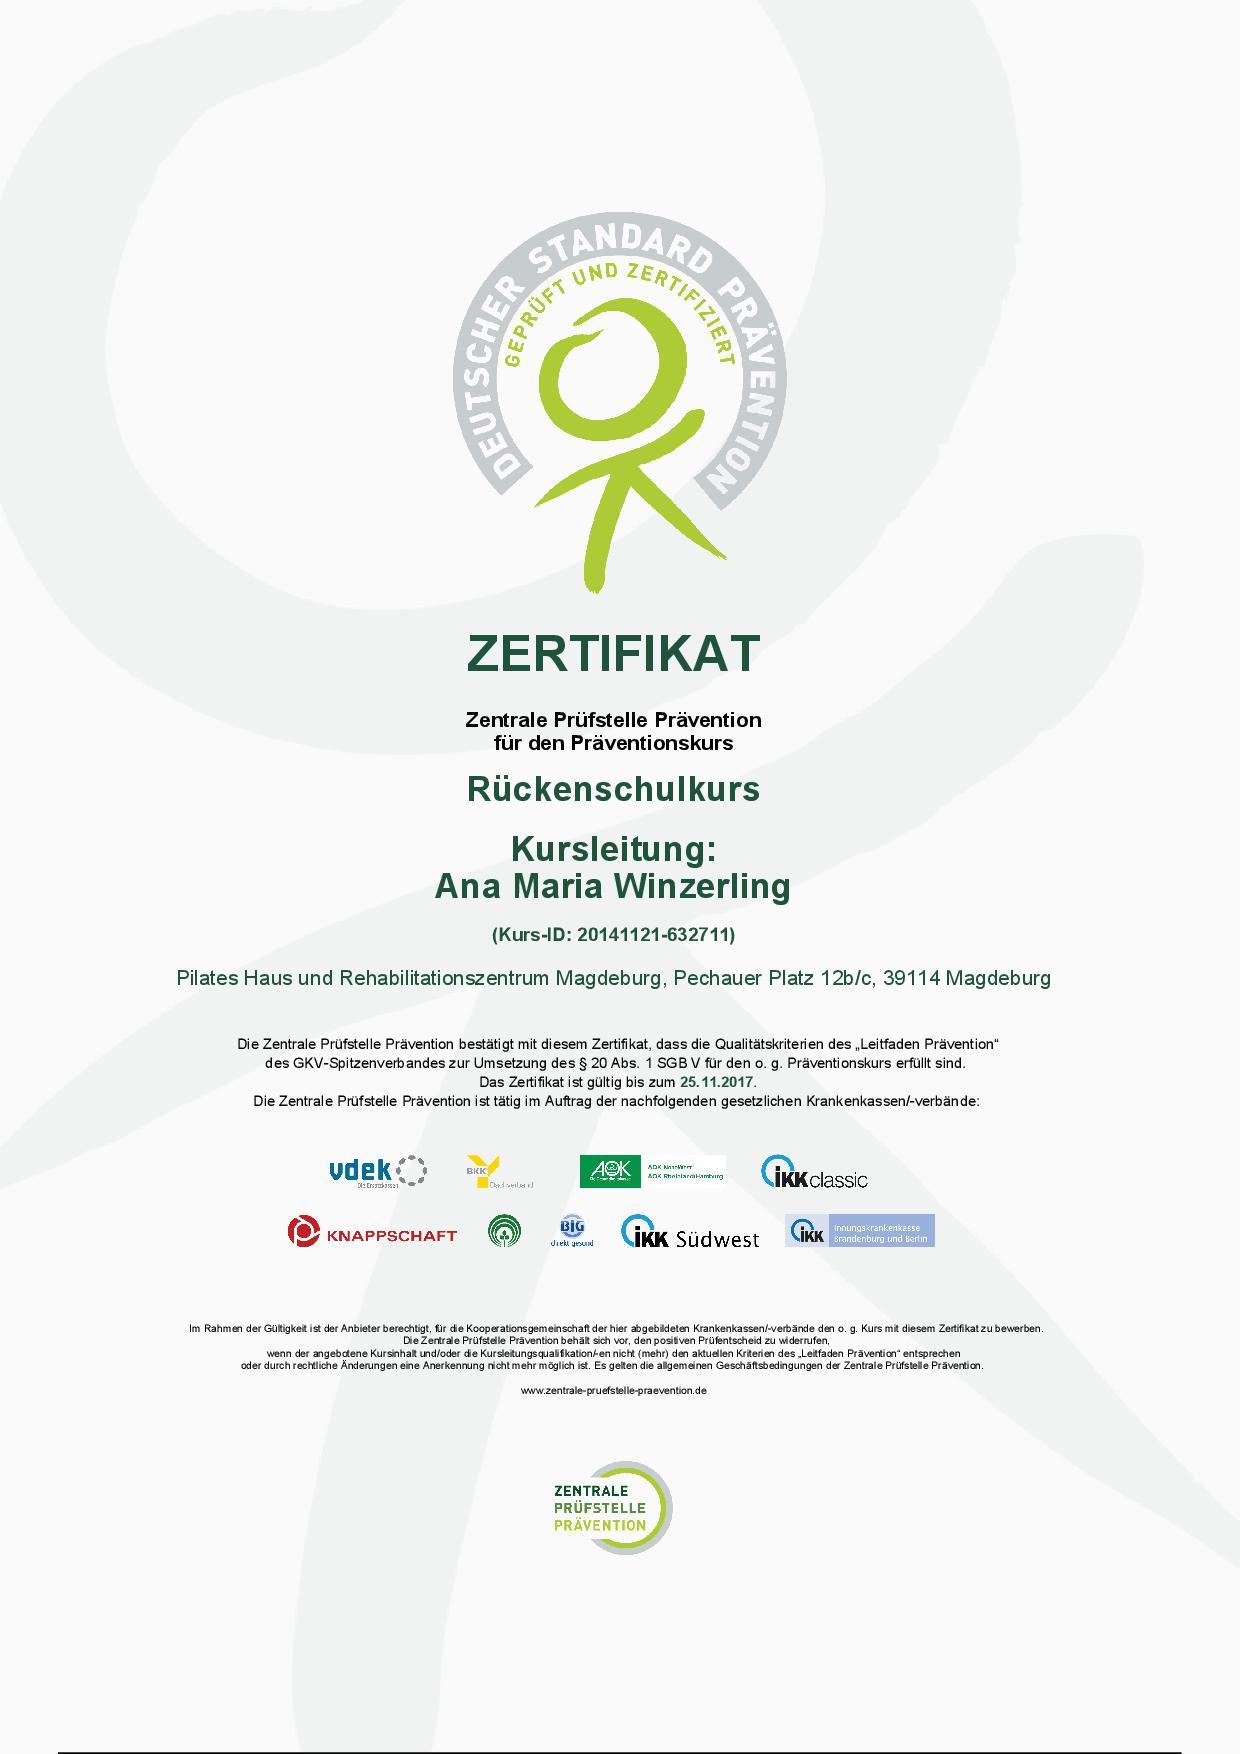 zertifikat_20141121-632711-001